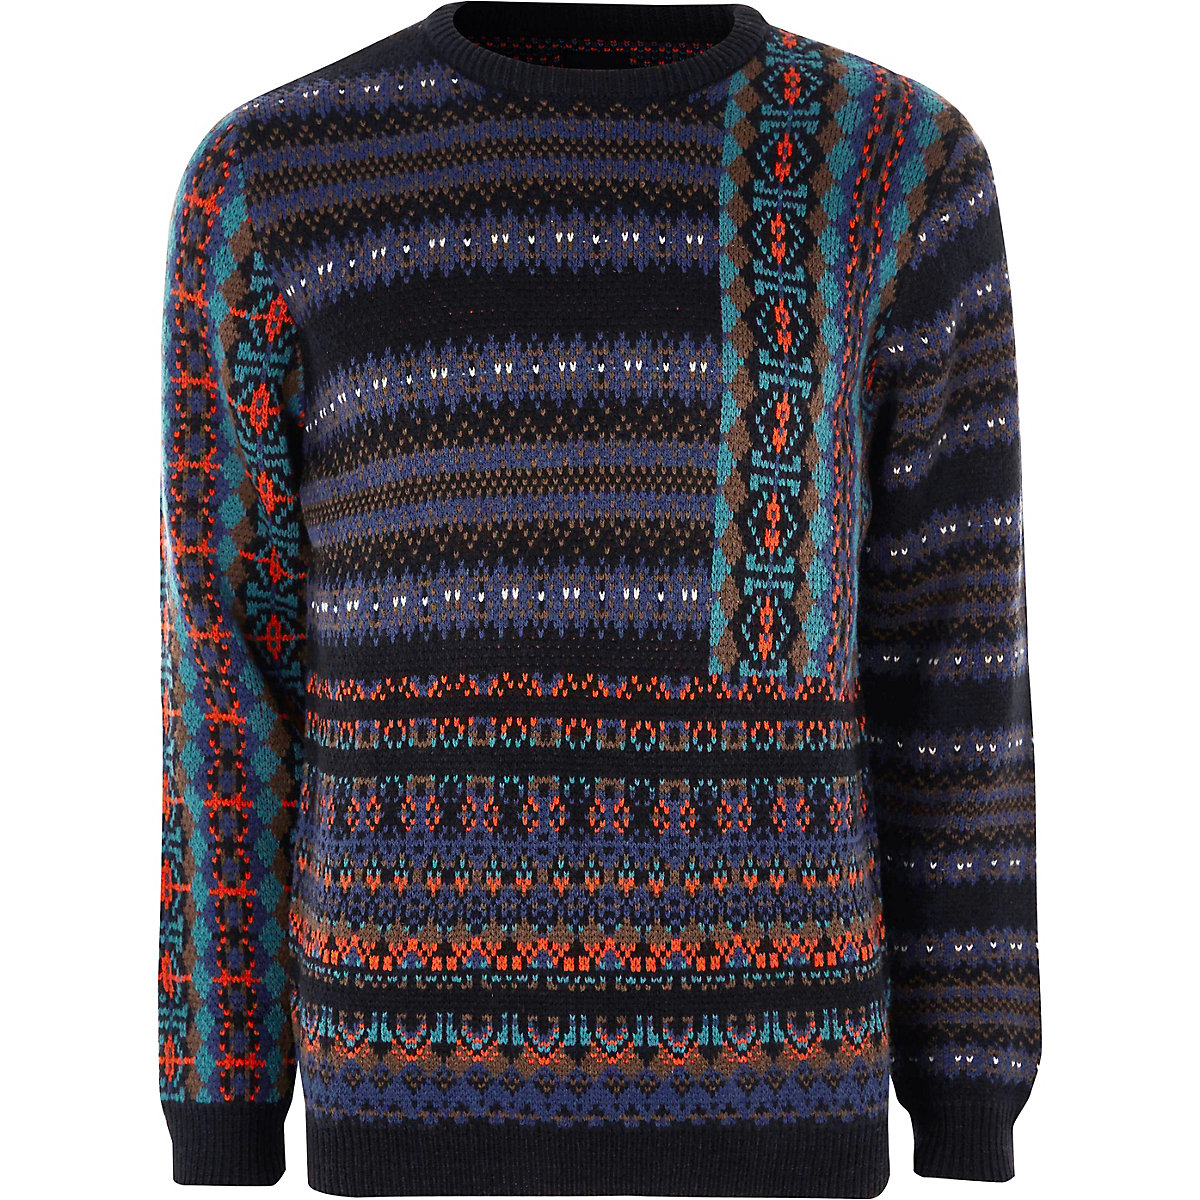 Navy mixed Fairisle knit Christmas sweater